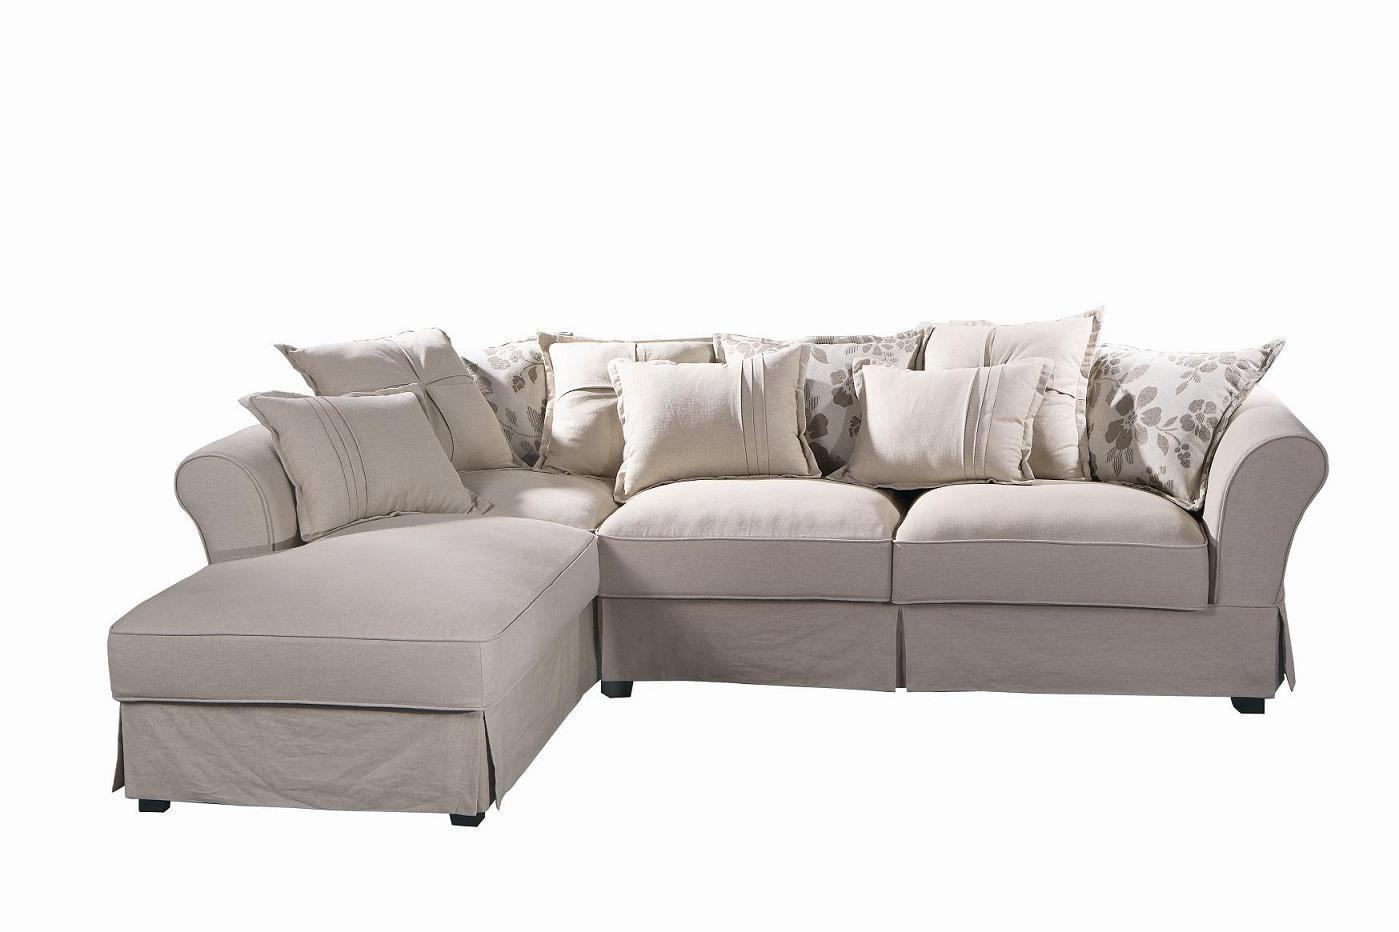 Affordable Sofa Best Sofas Ideas